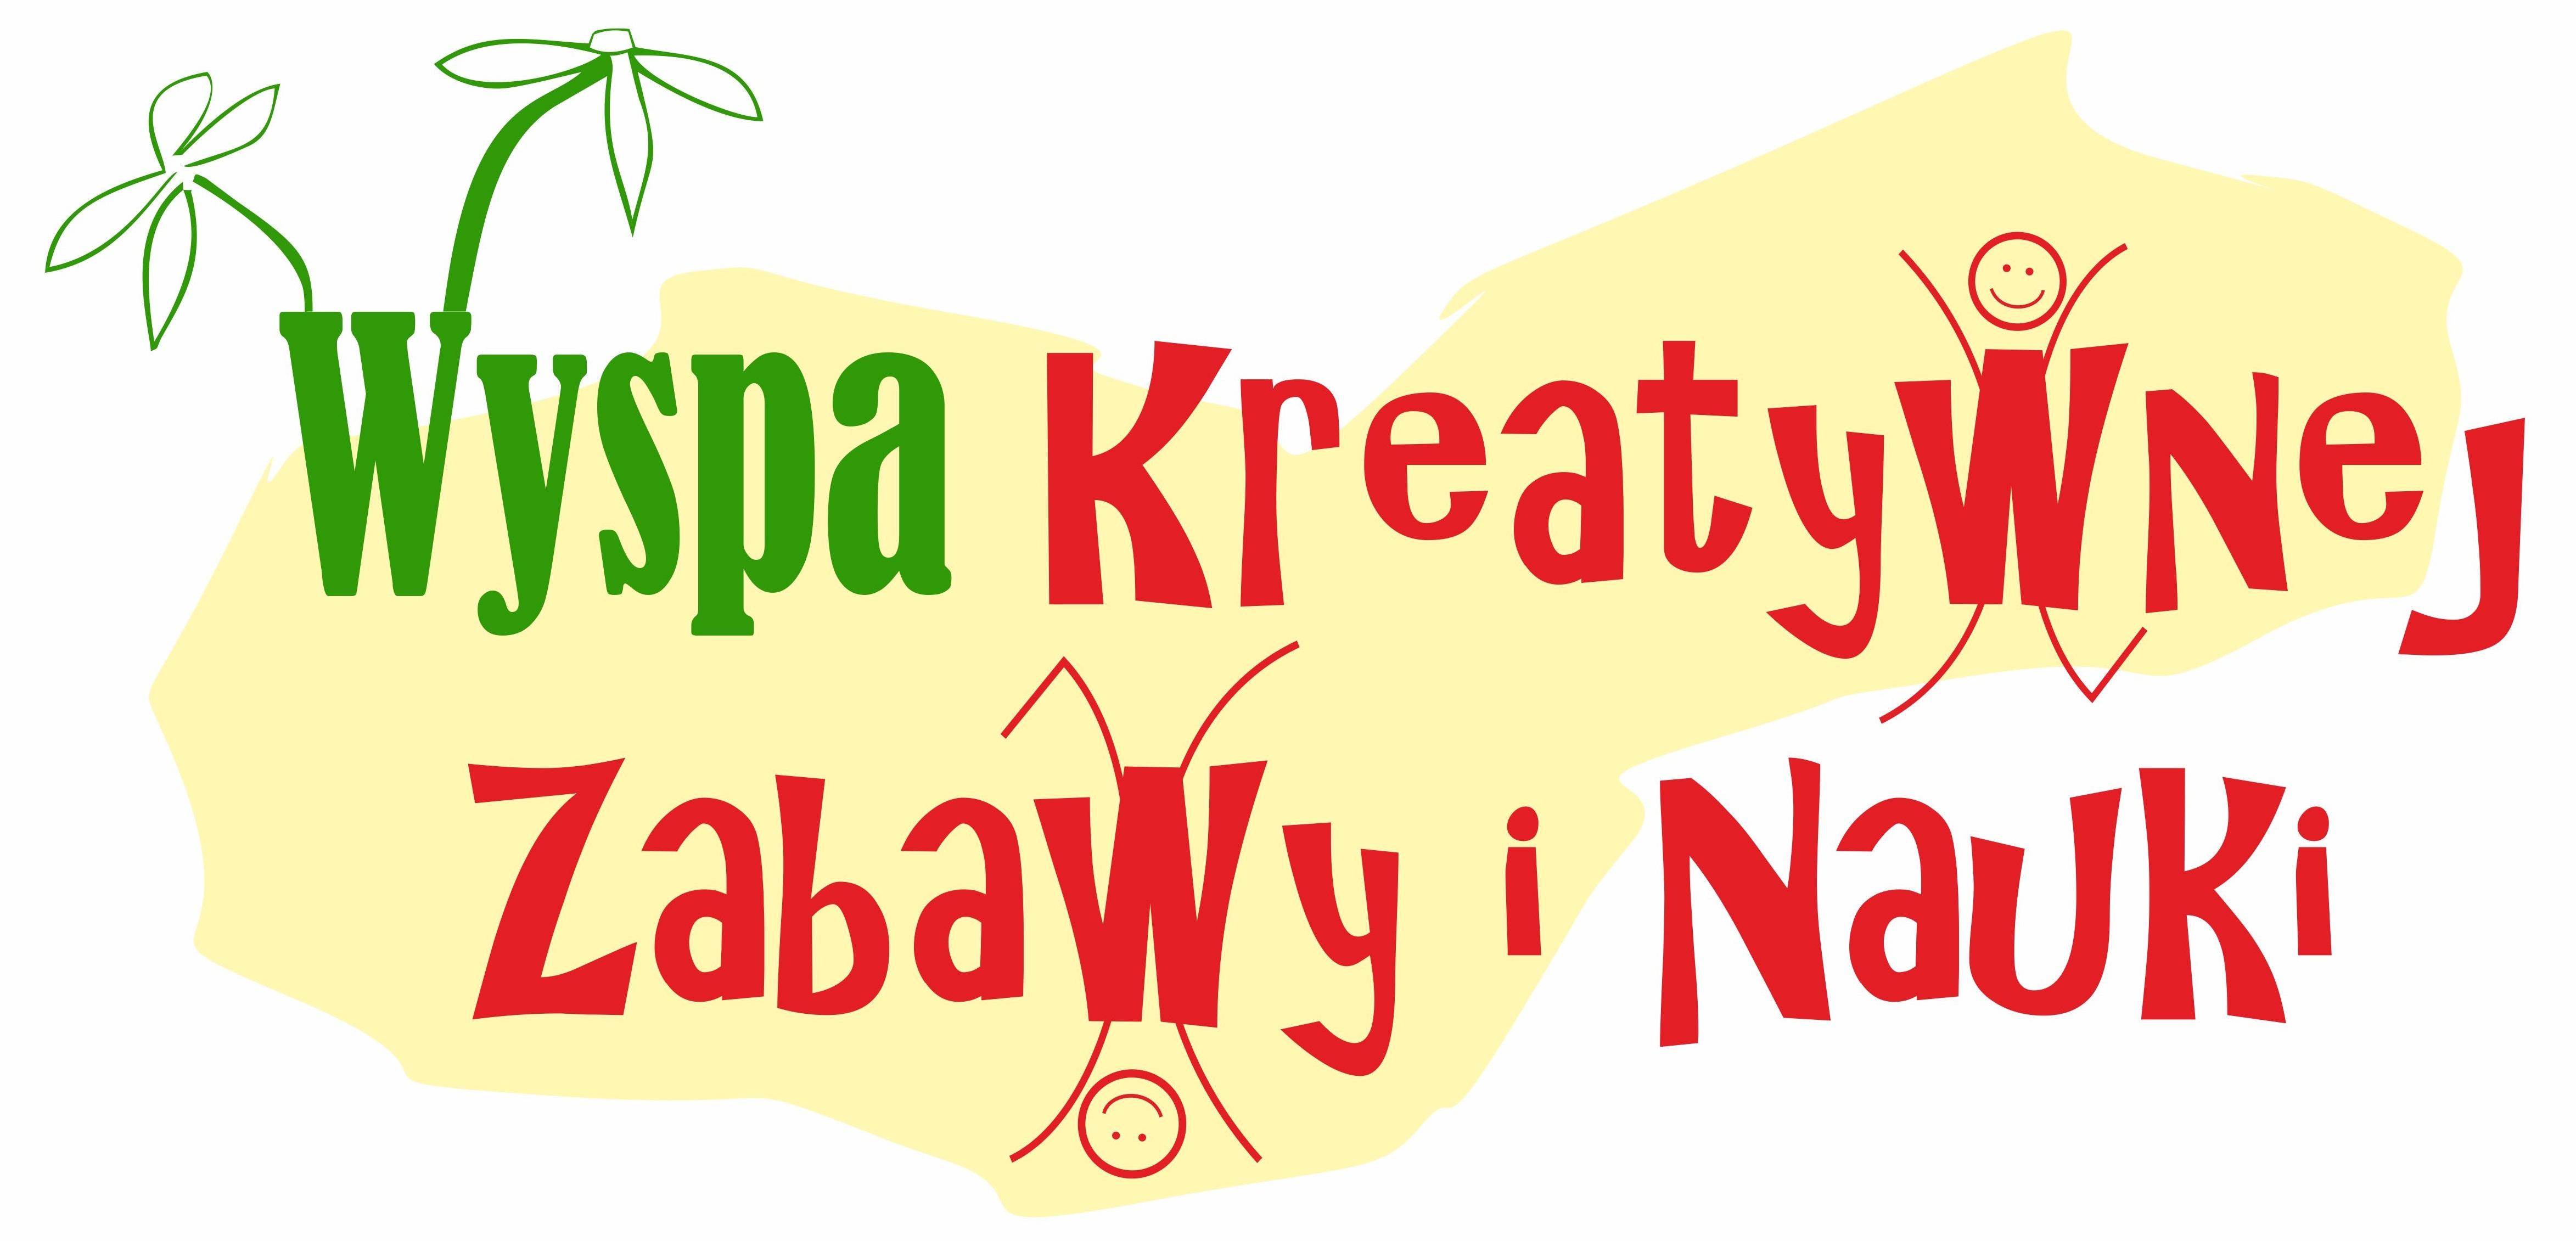 wyspa_logo.jpg